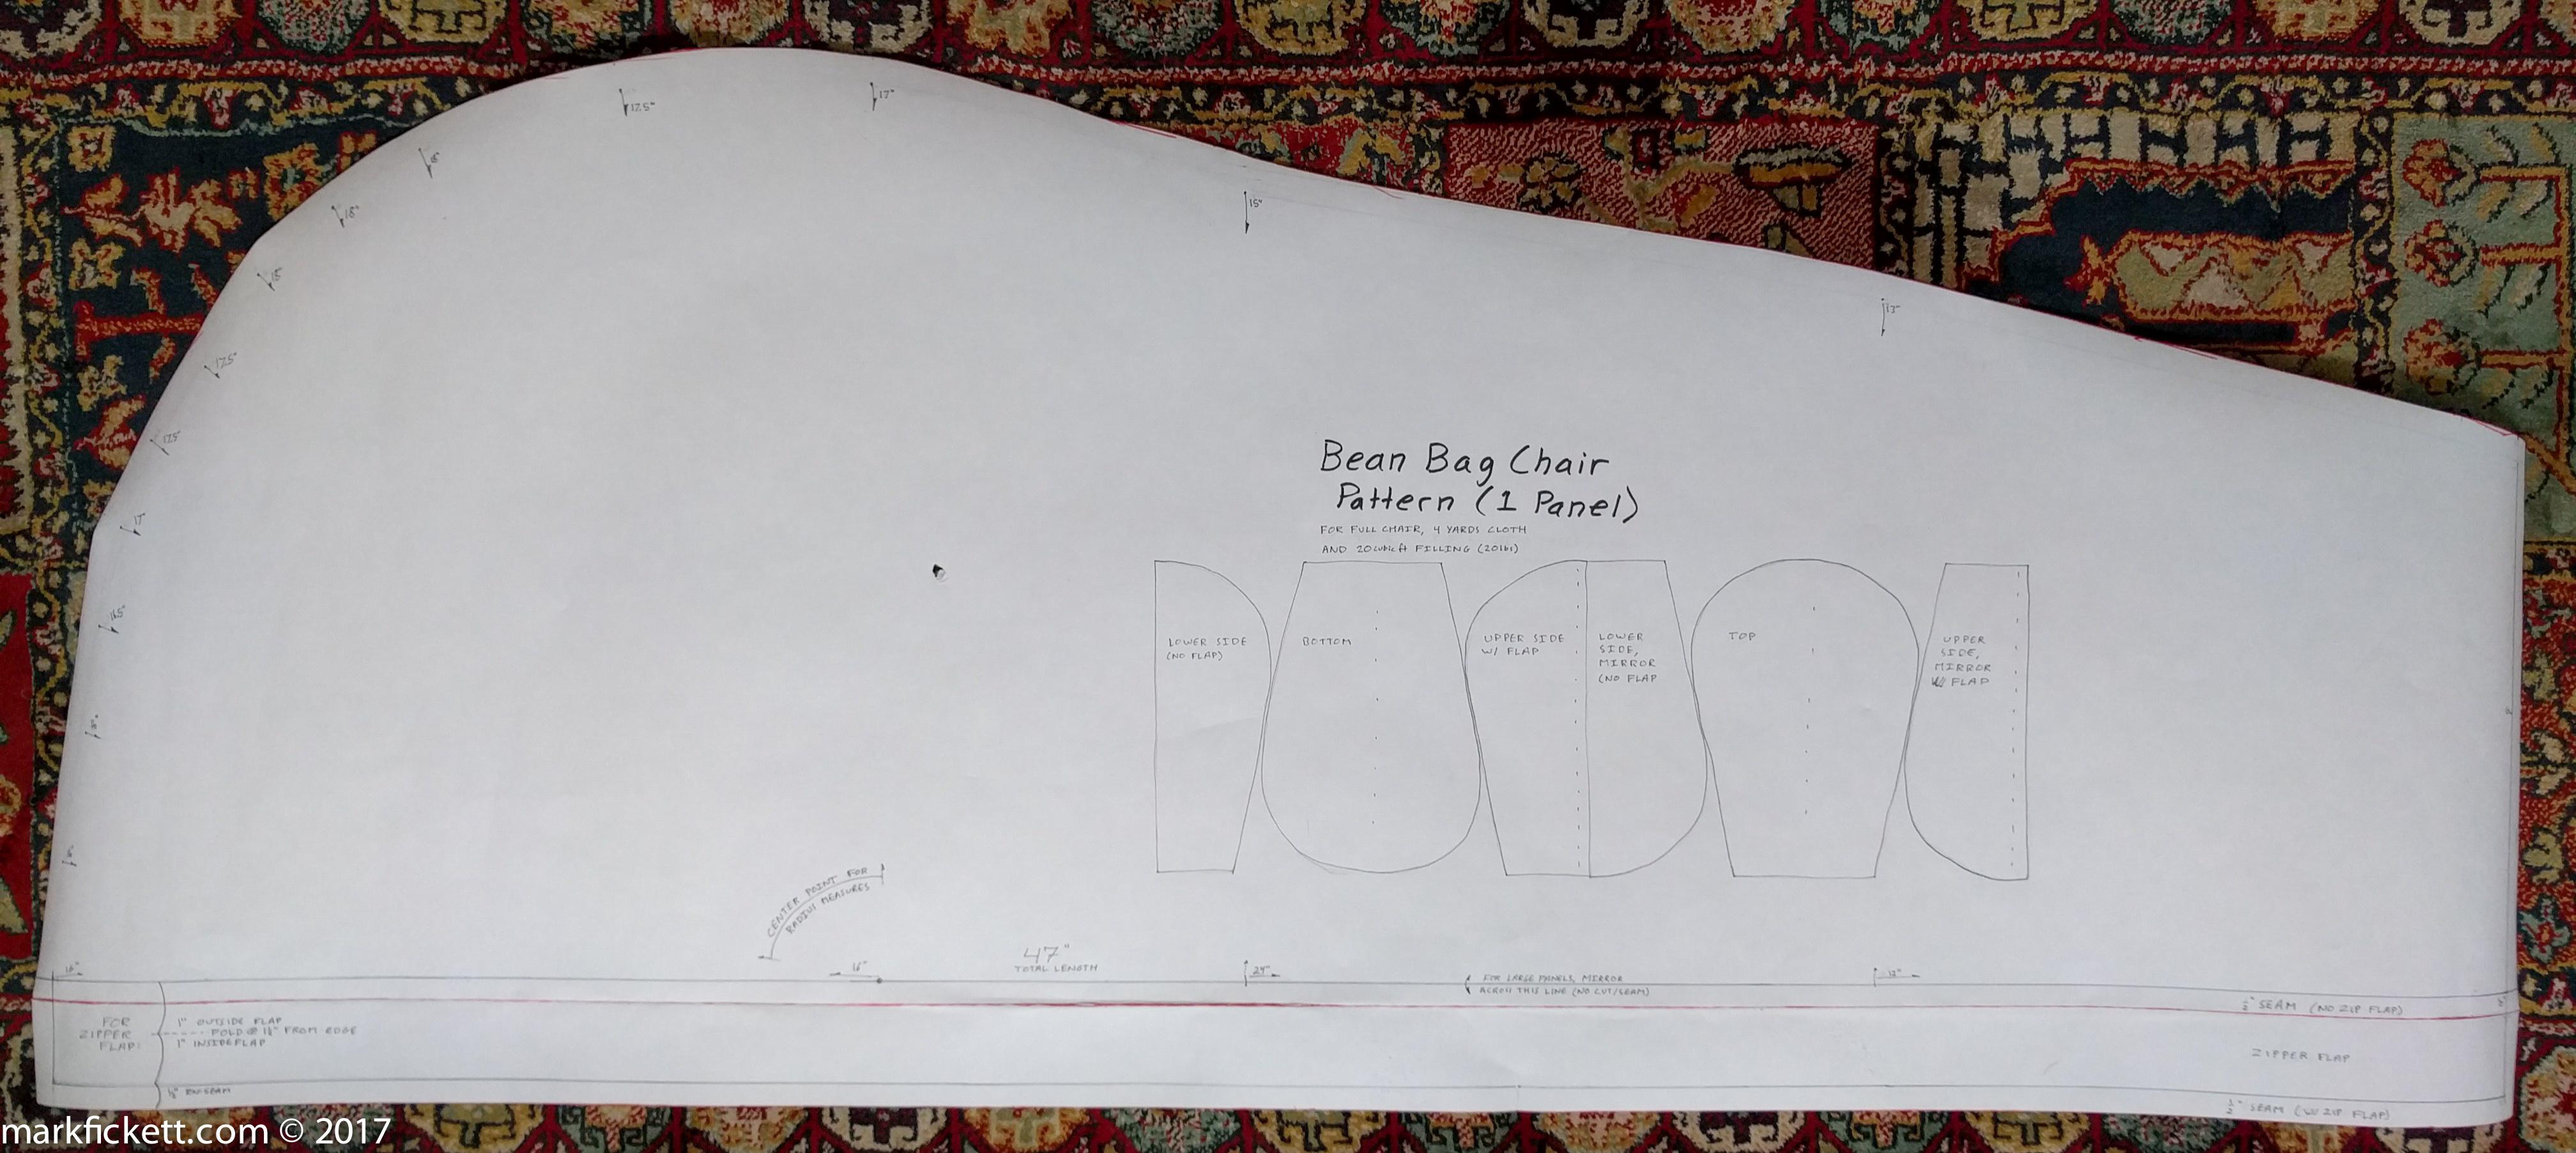 Stupendous Mark Fickett Art Stuff Bean Bag Chair Creativecarmelina Interior Chair Design Creativecarmelinacom